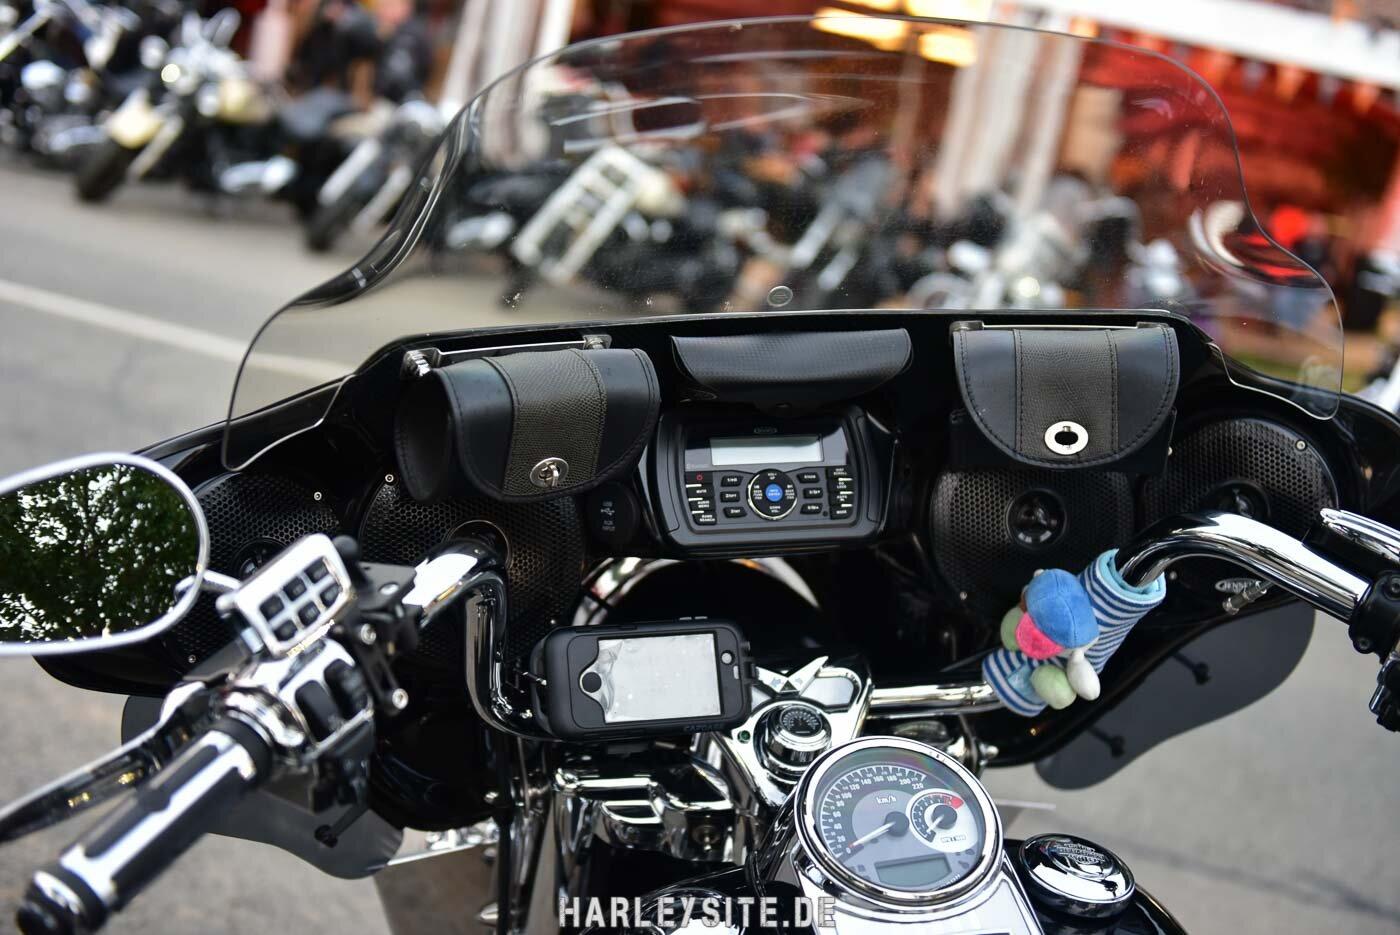 European-Bike-Week-9559